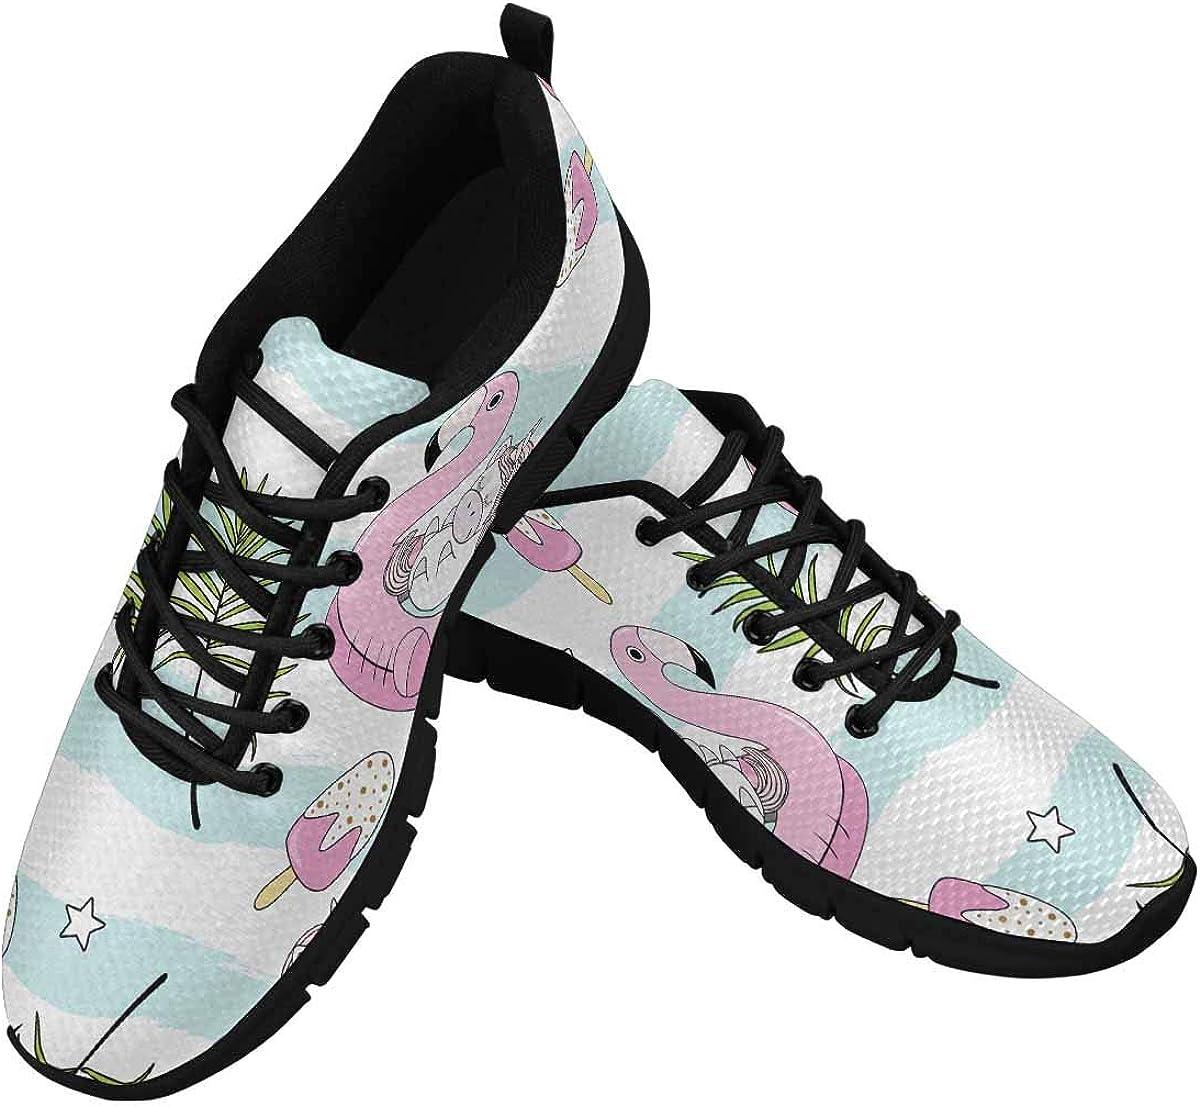 InterestPrint Unicorns on Flamingo Women's Breathable Comfort Mesh Fashion Sneakers